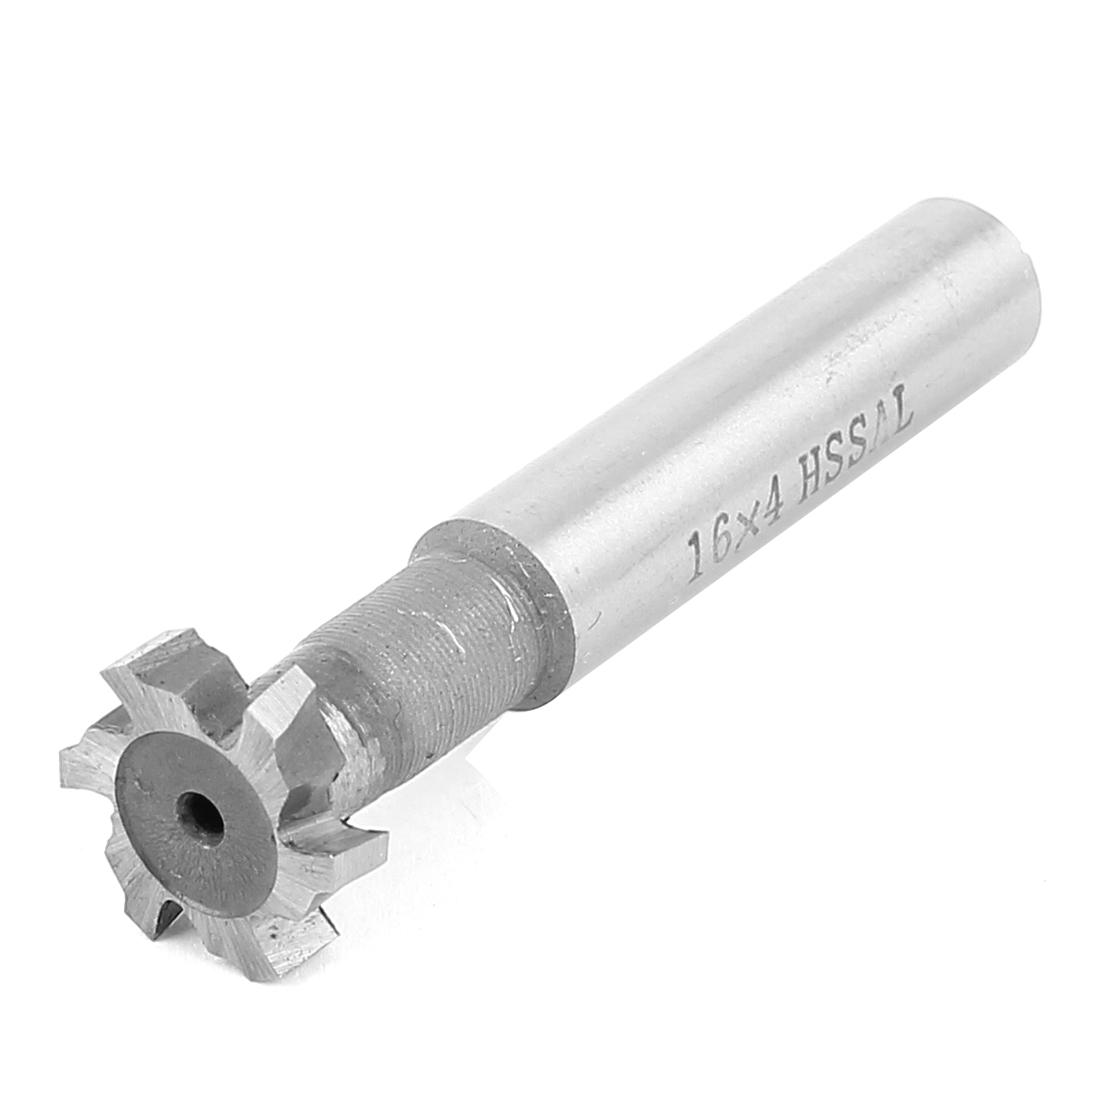 16mm Cutting Dia 4mm Depth HSS-AL 6 Flutes T Slot End Mill Cutter 64mm Long